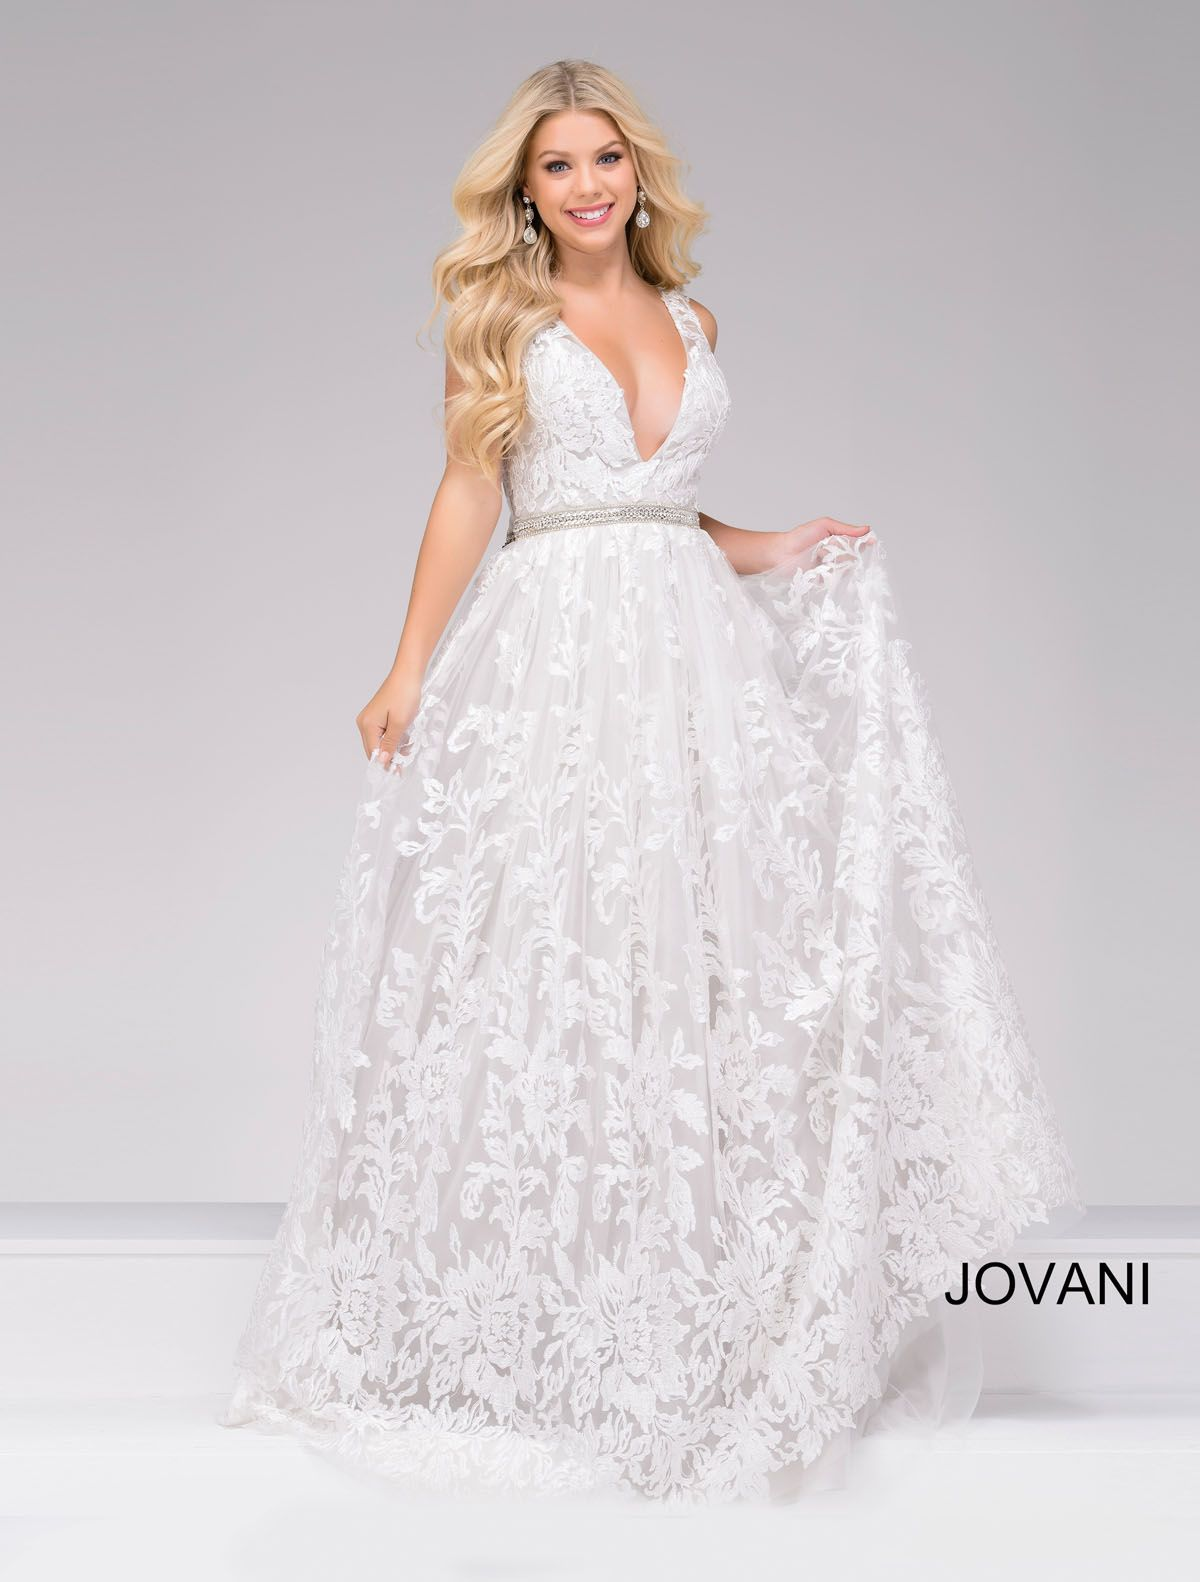 Jovani international prom association jovani prom dresses